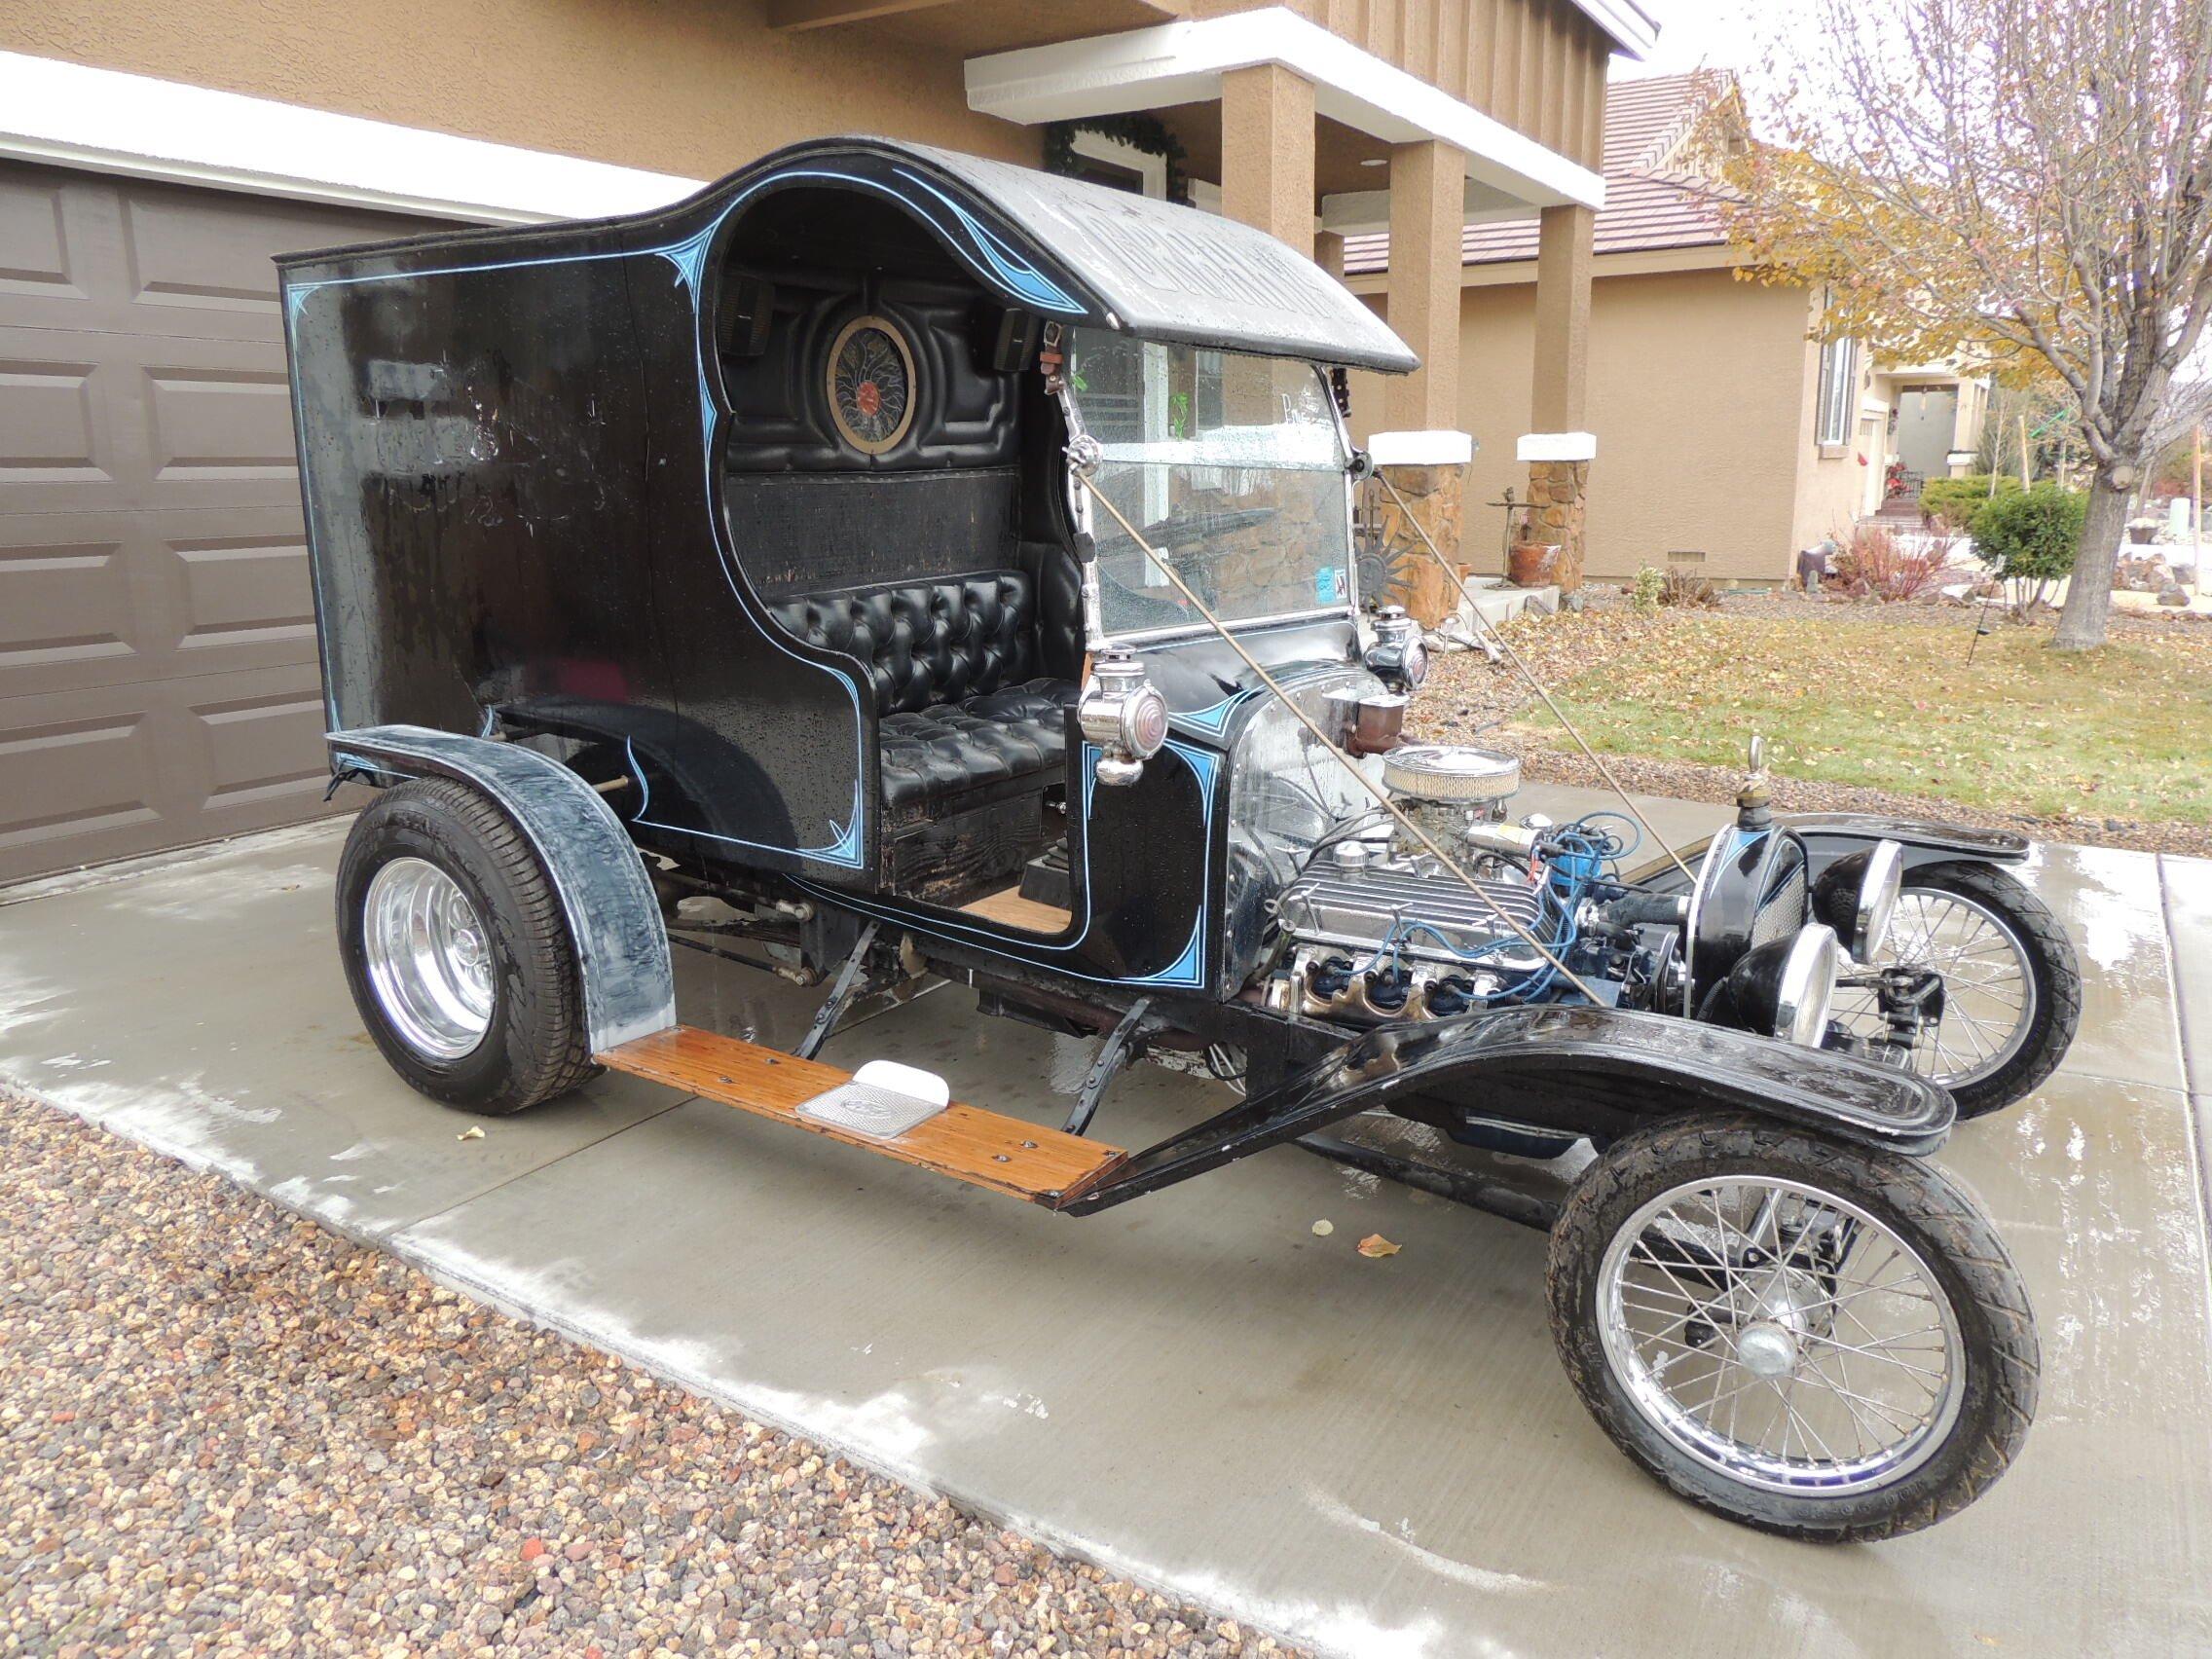 1915 Ford Model T antiques Car 100773055 dfe0b539b8936a9ddfa09e8838abd7f7?r\\\\\\\=fit\\\\\\\&w\\\\\\\=430\\\\\\\&s\\\\\\\=1 1925 model t wiring diagrams schematic diagrams